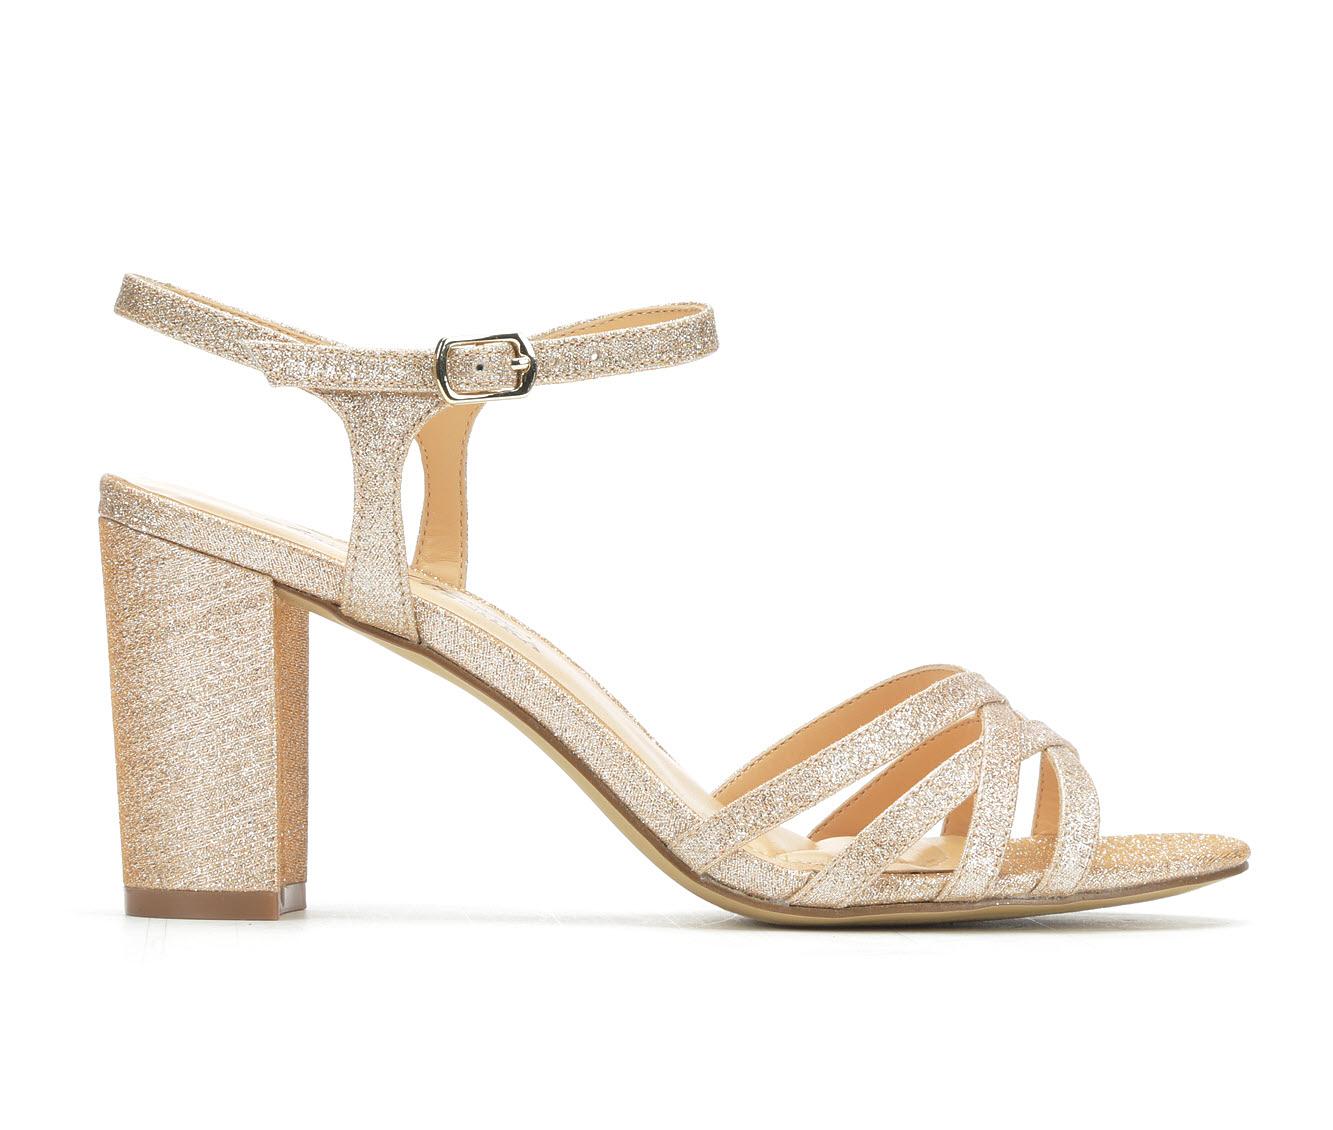 American Glamour BadgleyM Xandra Women's Dress Shoe (Gold Canvas)